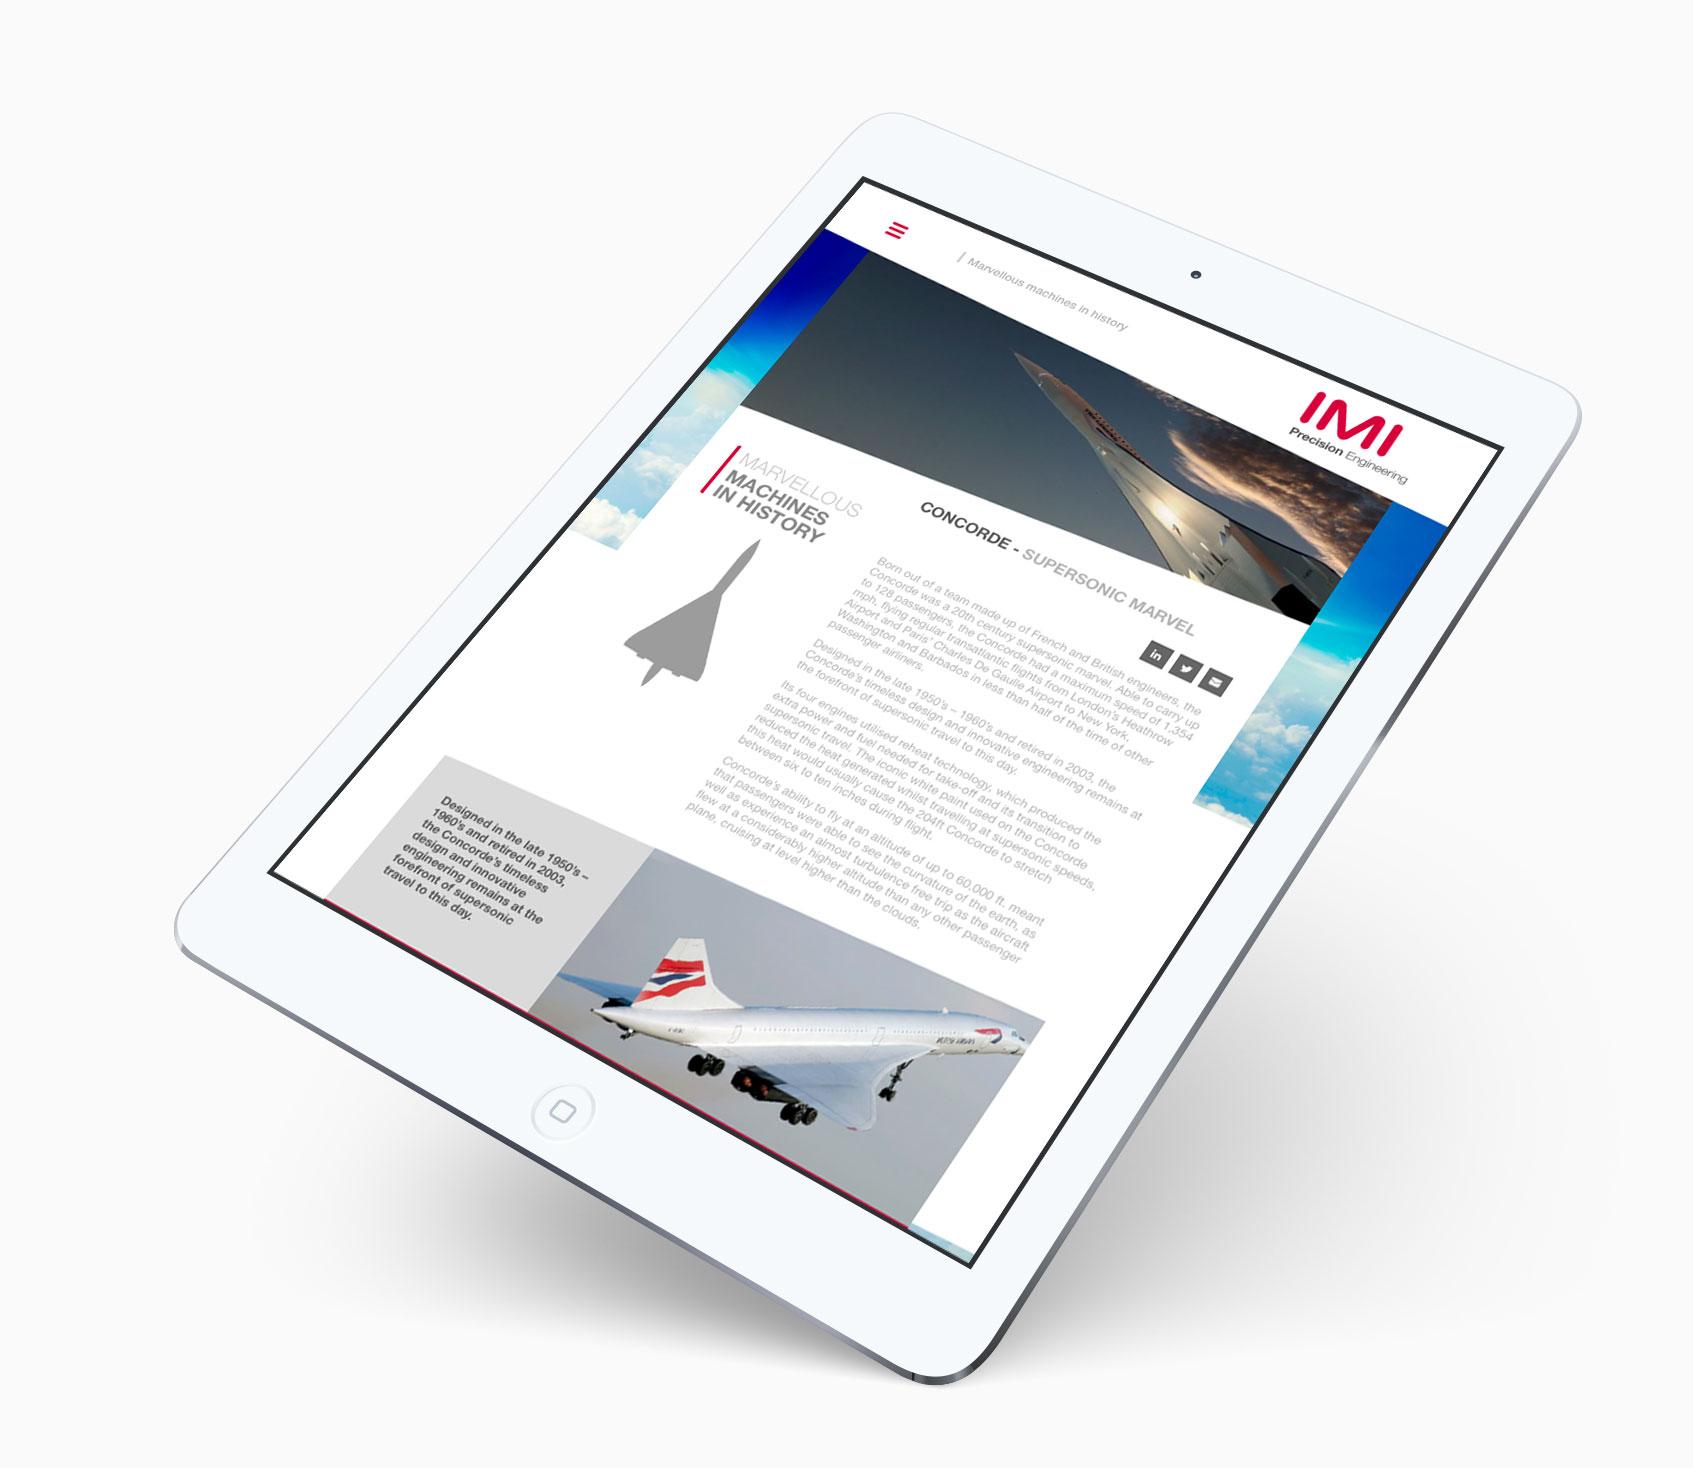 Mans-most-marvellous-machines-website-on-tablet